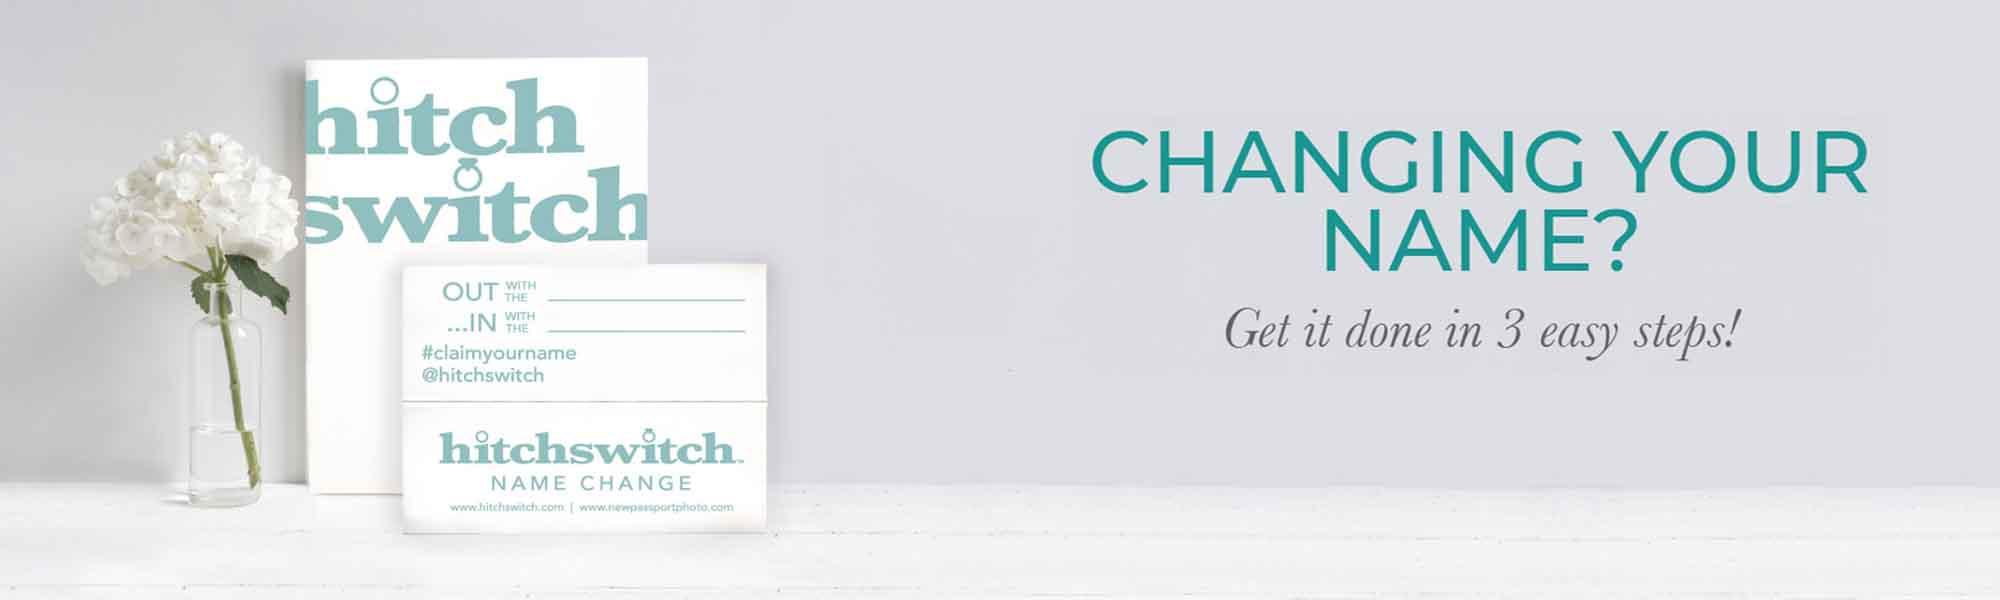 hitch switch name change kit